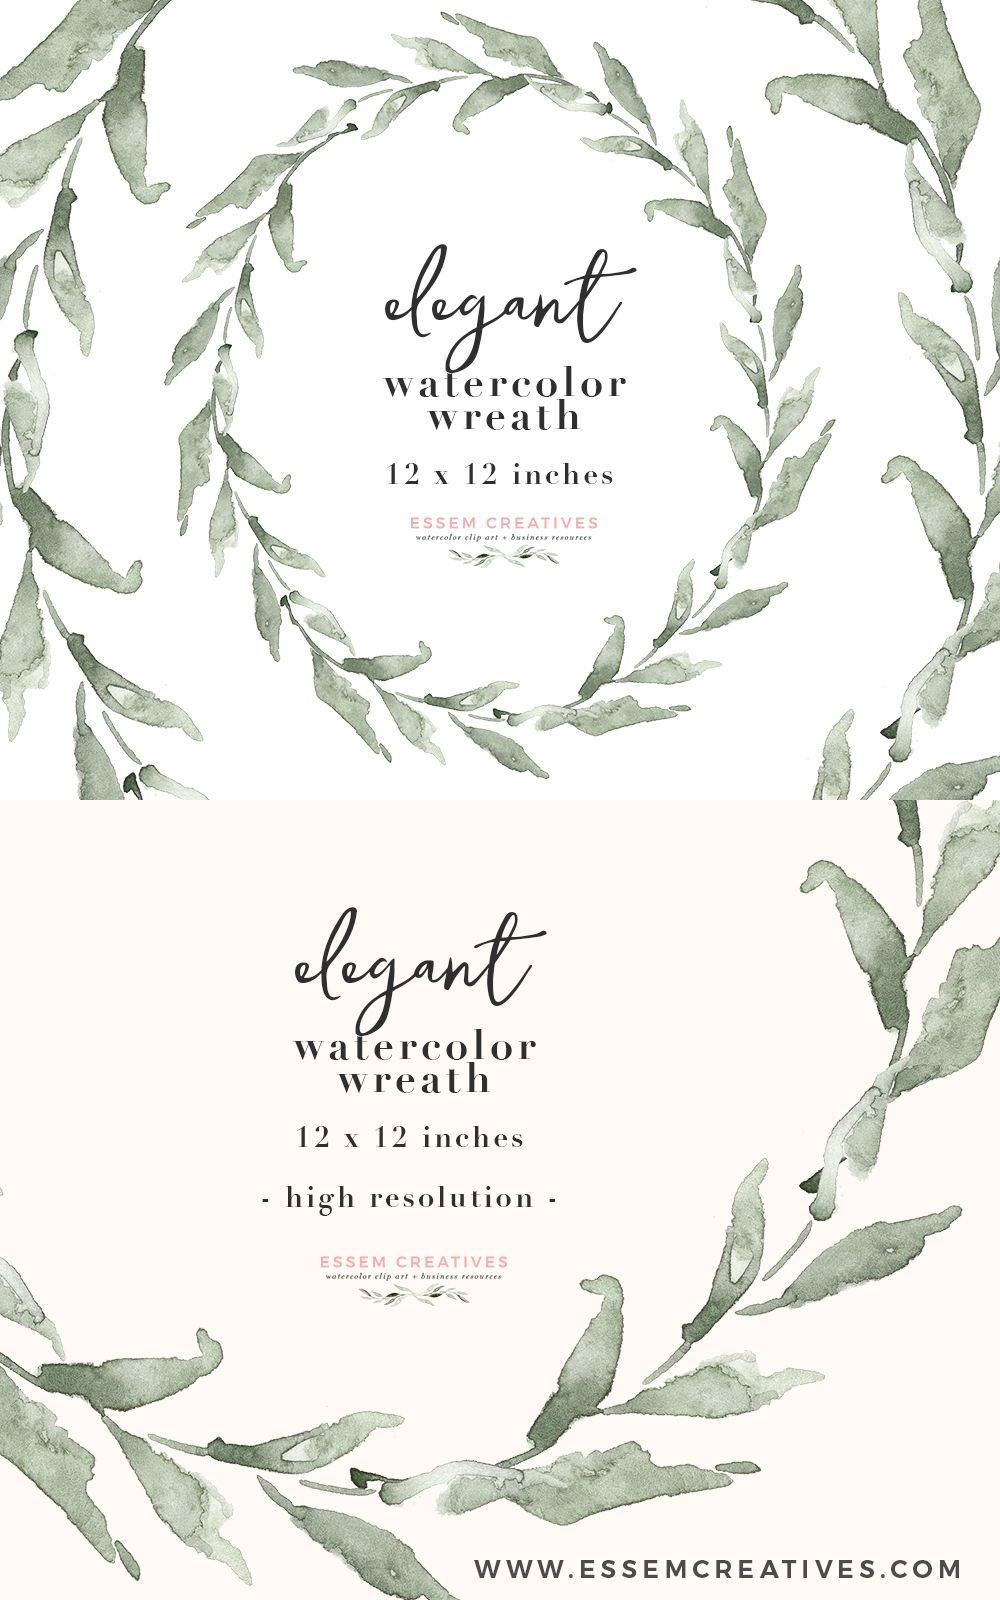 Watercolor olive wreath clipart eucalyptus wreath png for save the watercolor olive wreath clipart eucalyptus wreath png for save the date card wedding invitation stopboris Images